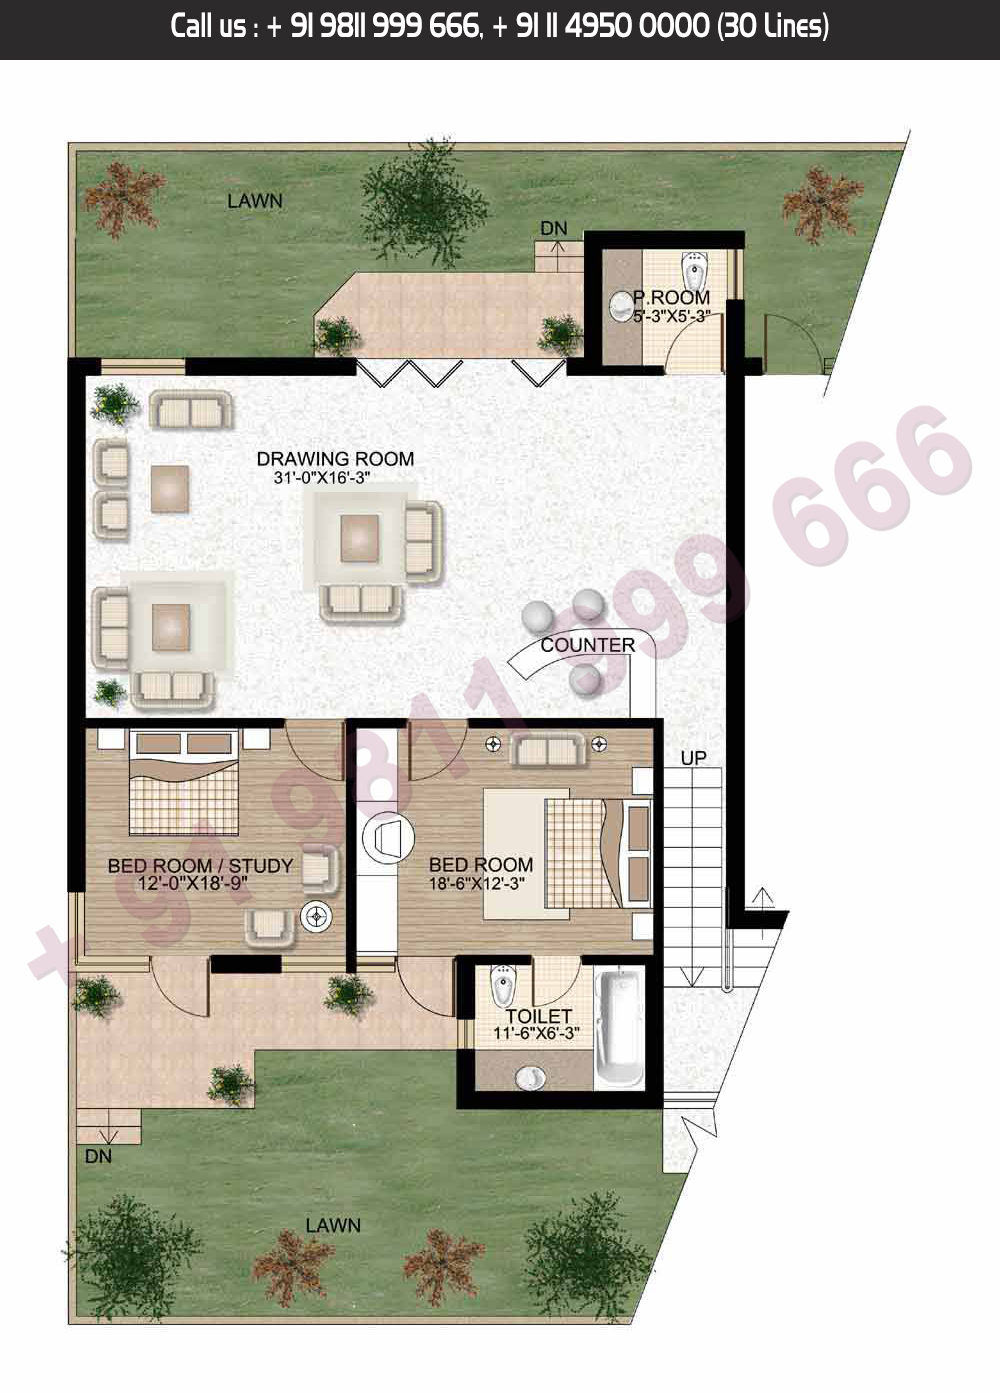 Lower Level, 5 Bed + Servant, Saleable Area: 3319.91 + 1100.19 Terrace